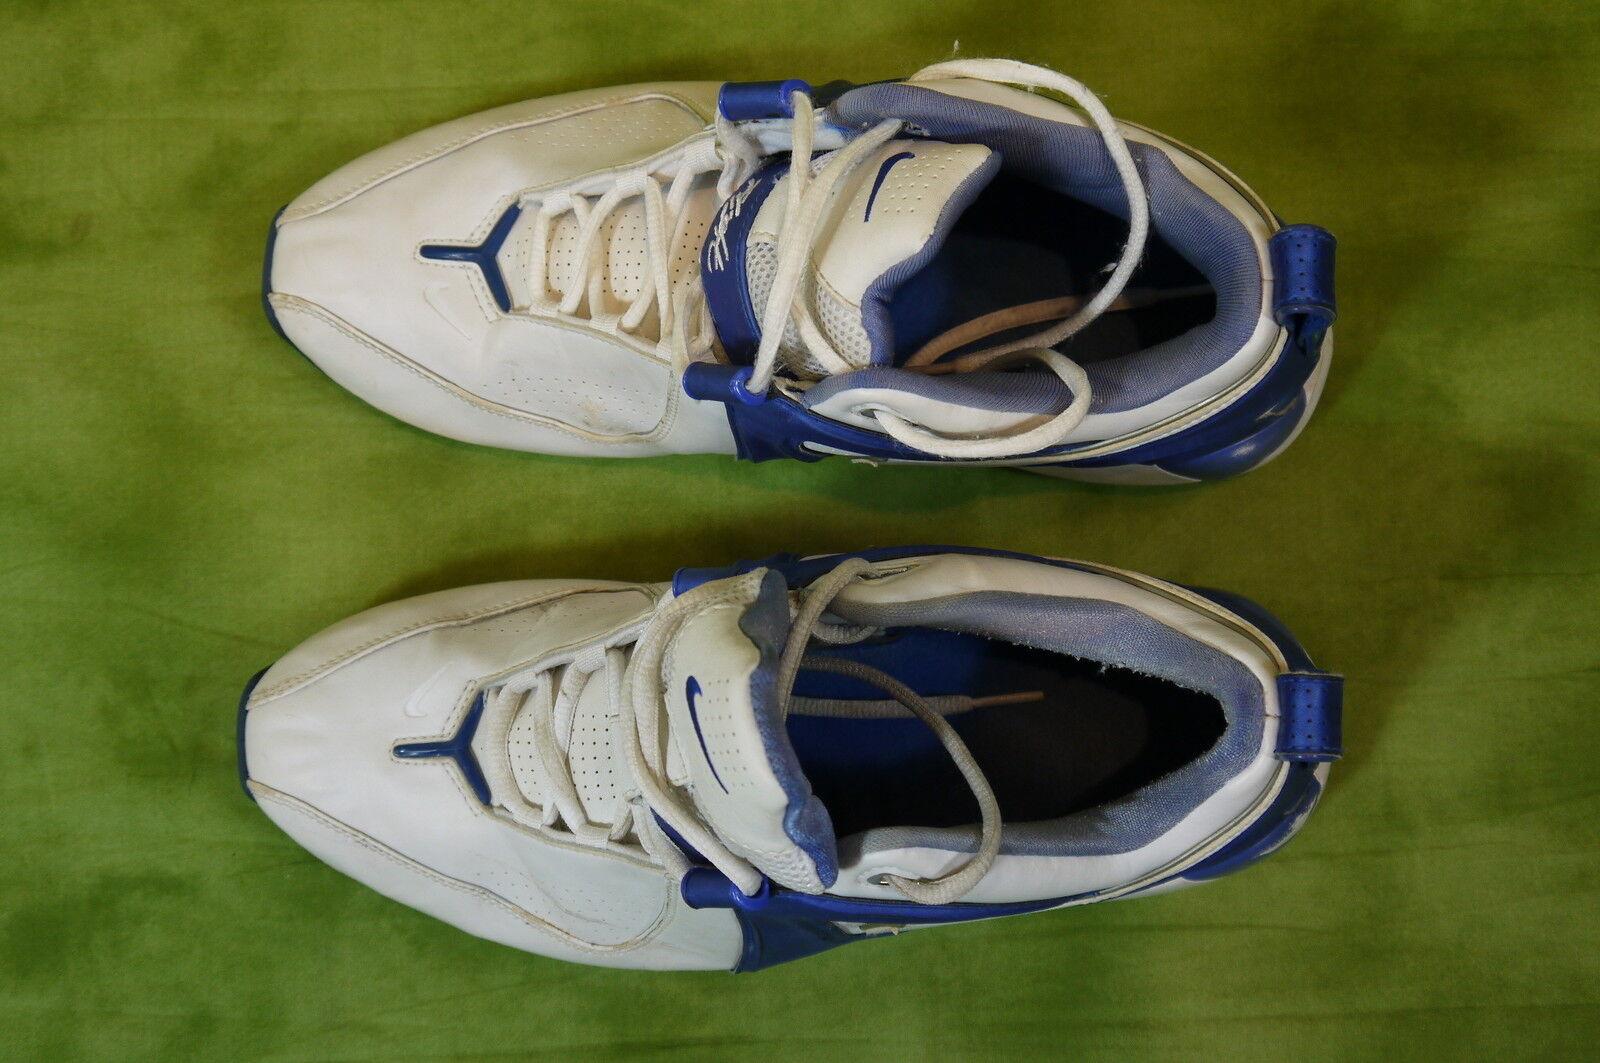 Nike Basketball shoes  FLIGHT  Men's 11  color color color bluee   White fe3cd7